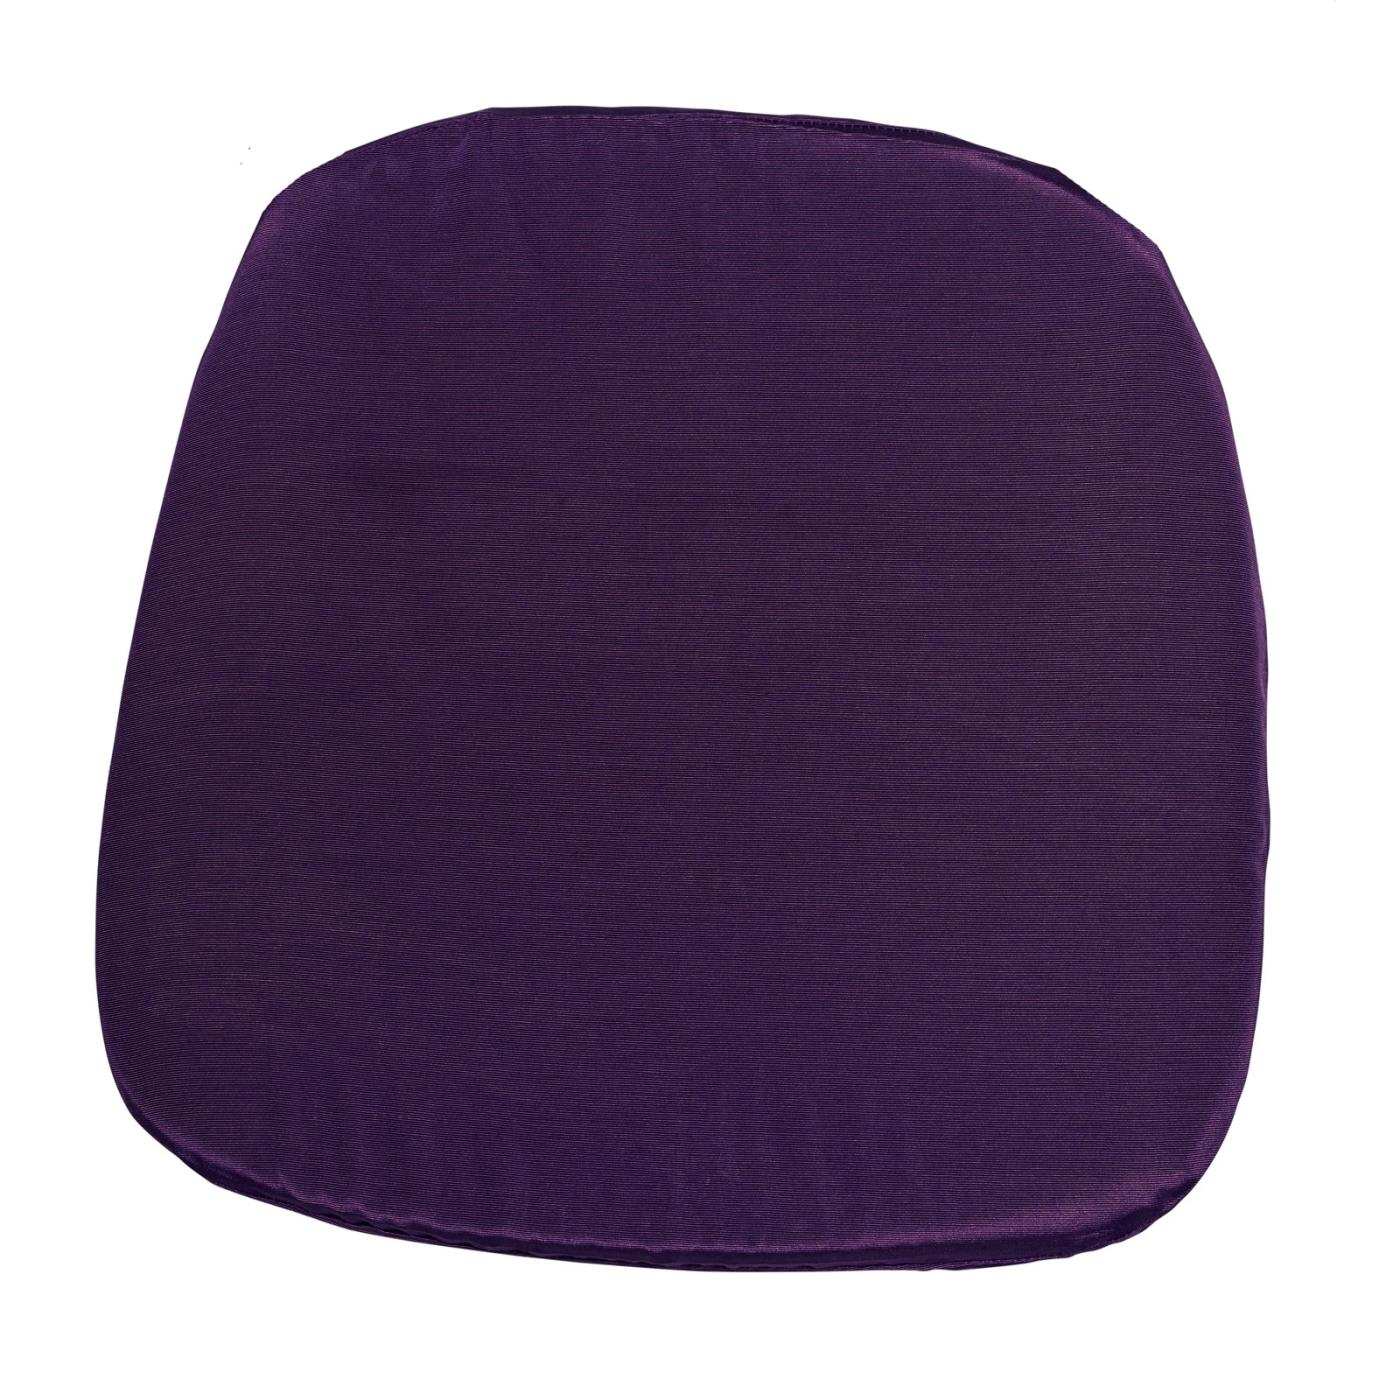 Bengaline Seat Cushion - Violet